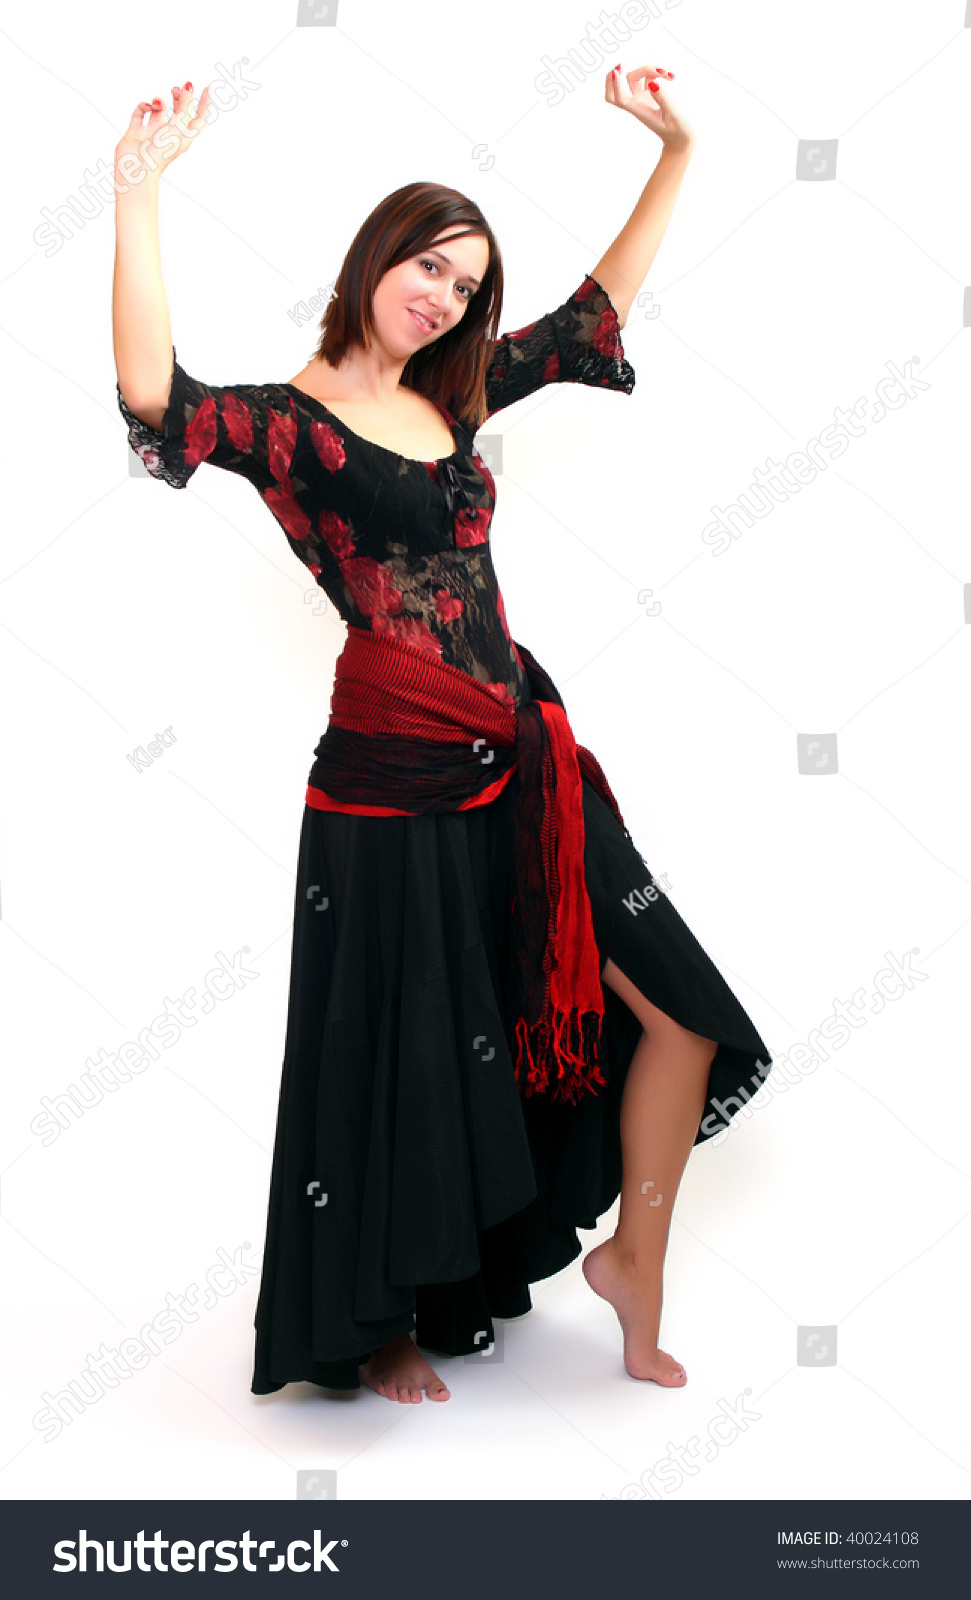 Gypsy clothing for women